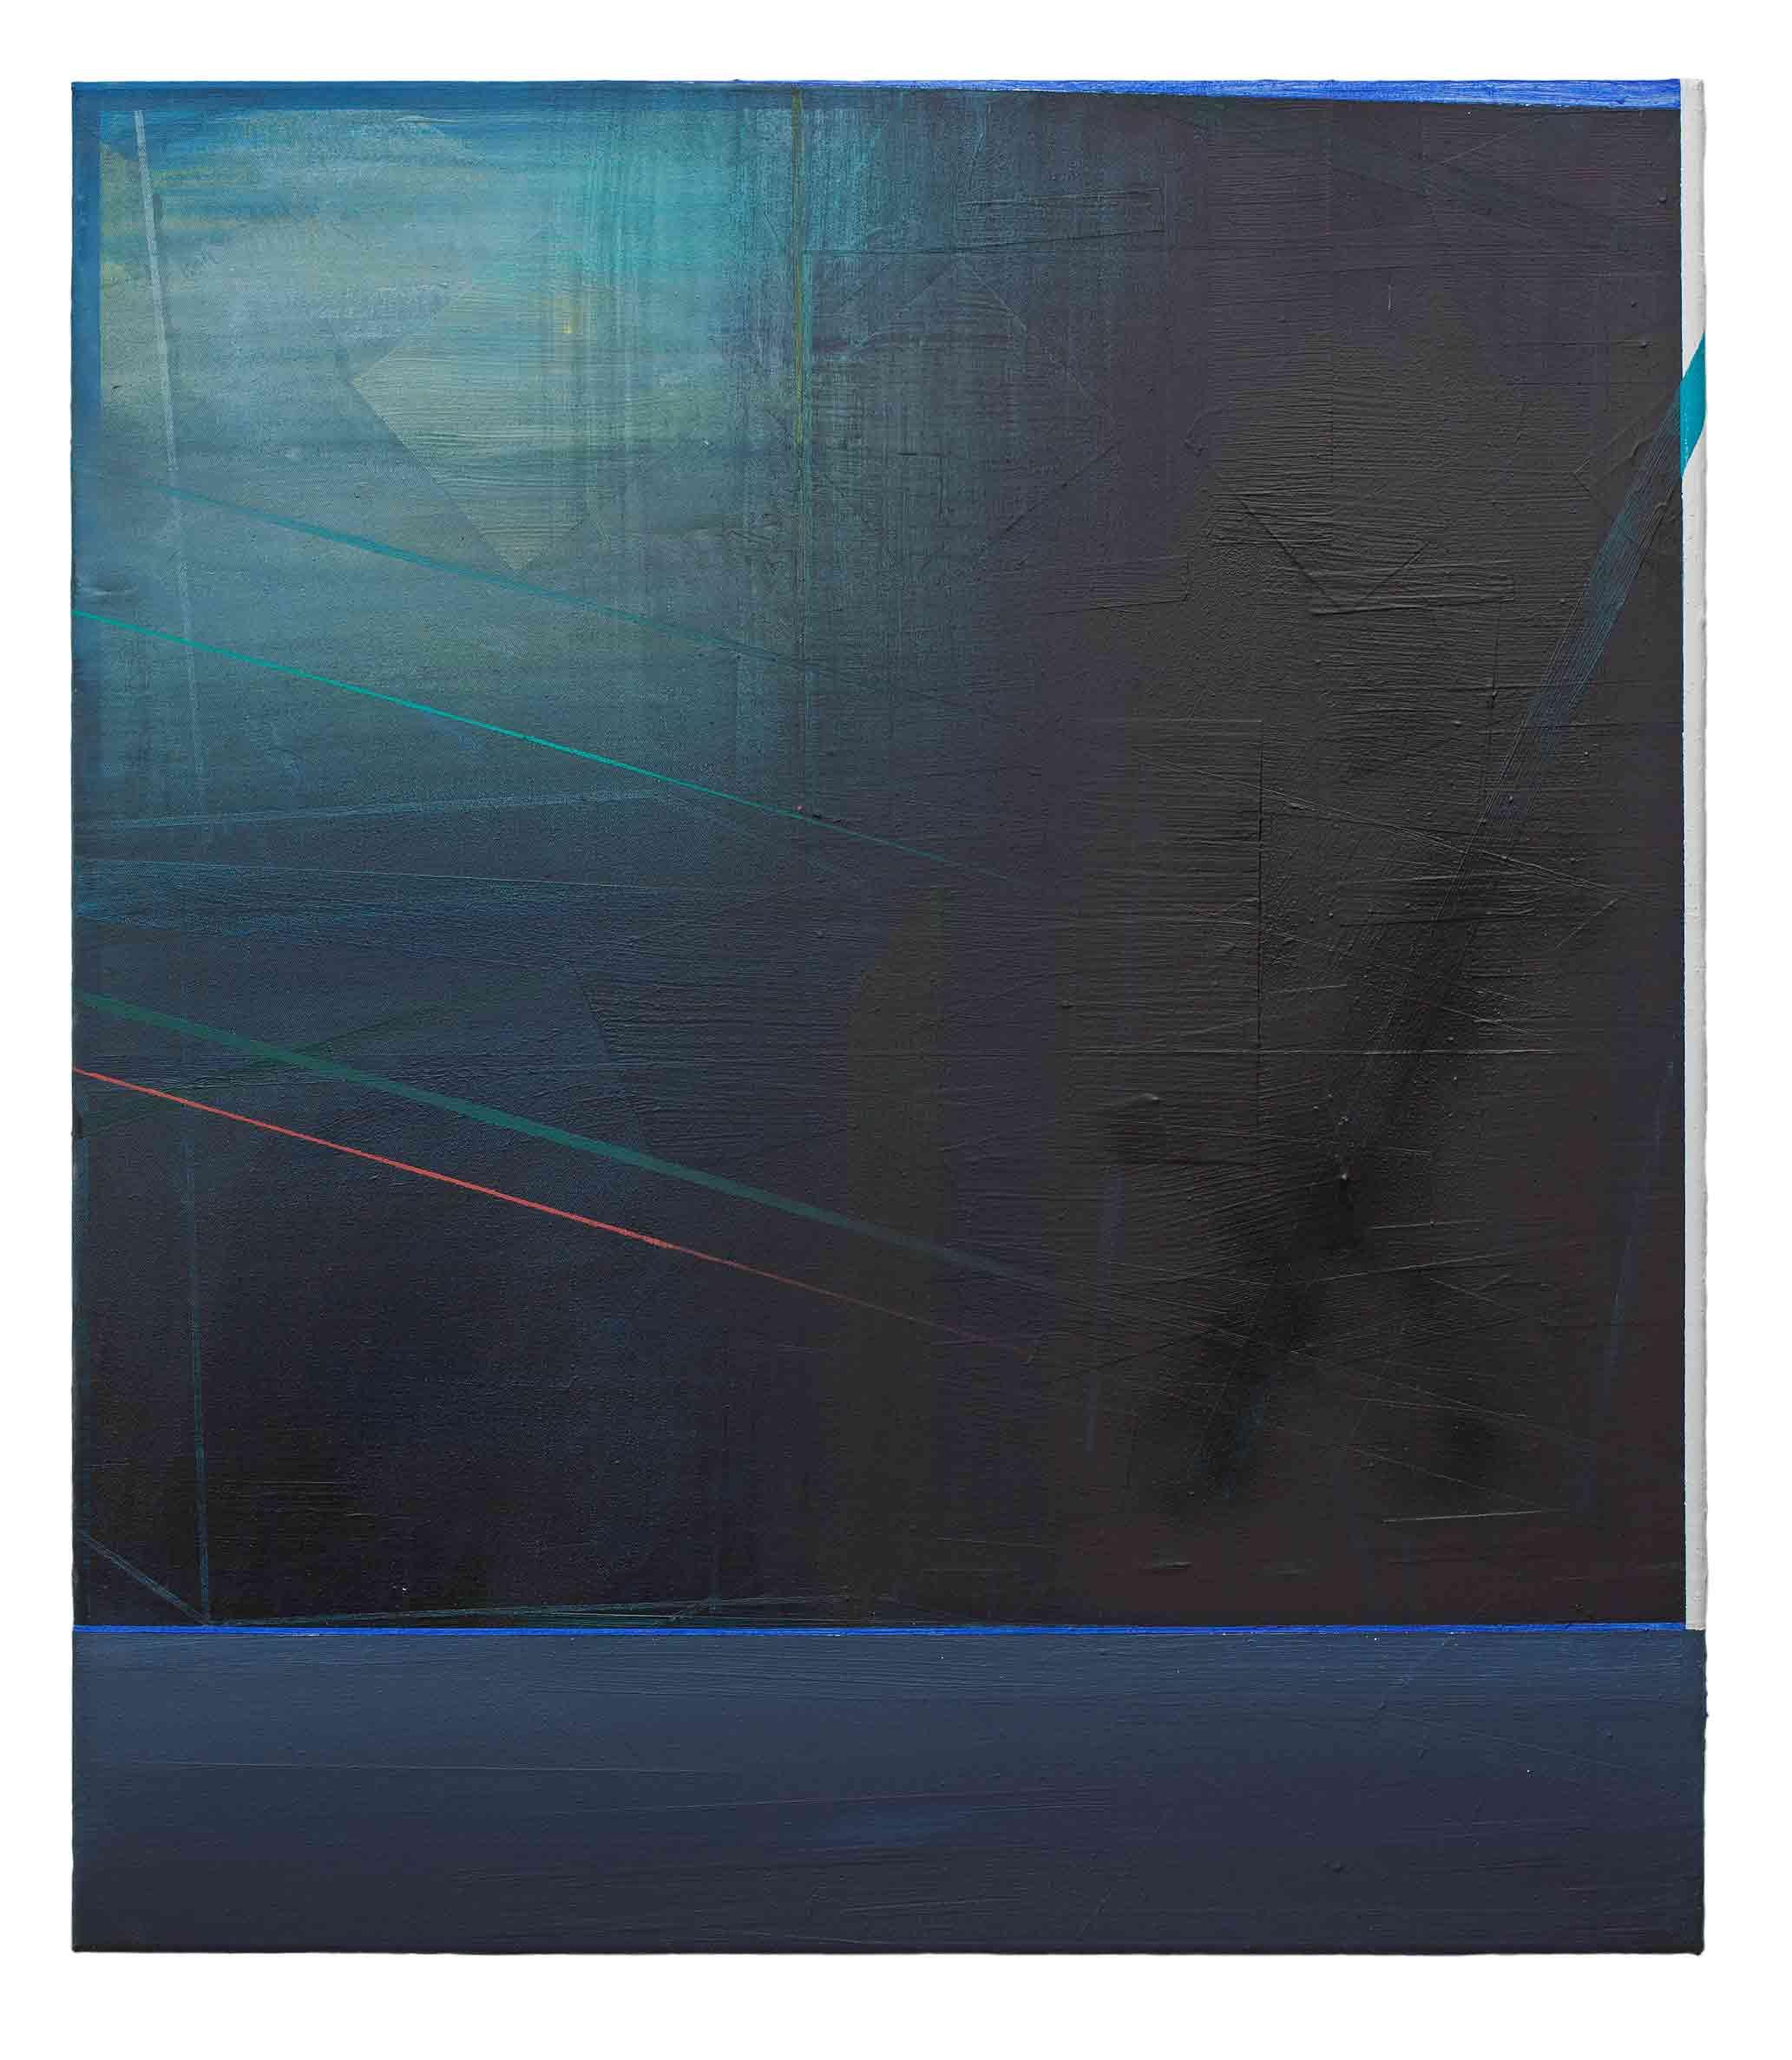 Storm   · 80 x 70 cm · Acryl, Pigment, Lack auf Leinwand, 2012